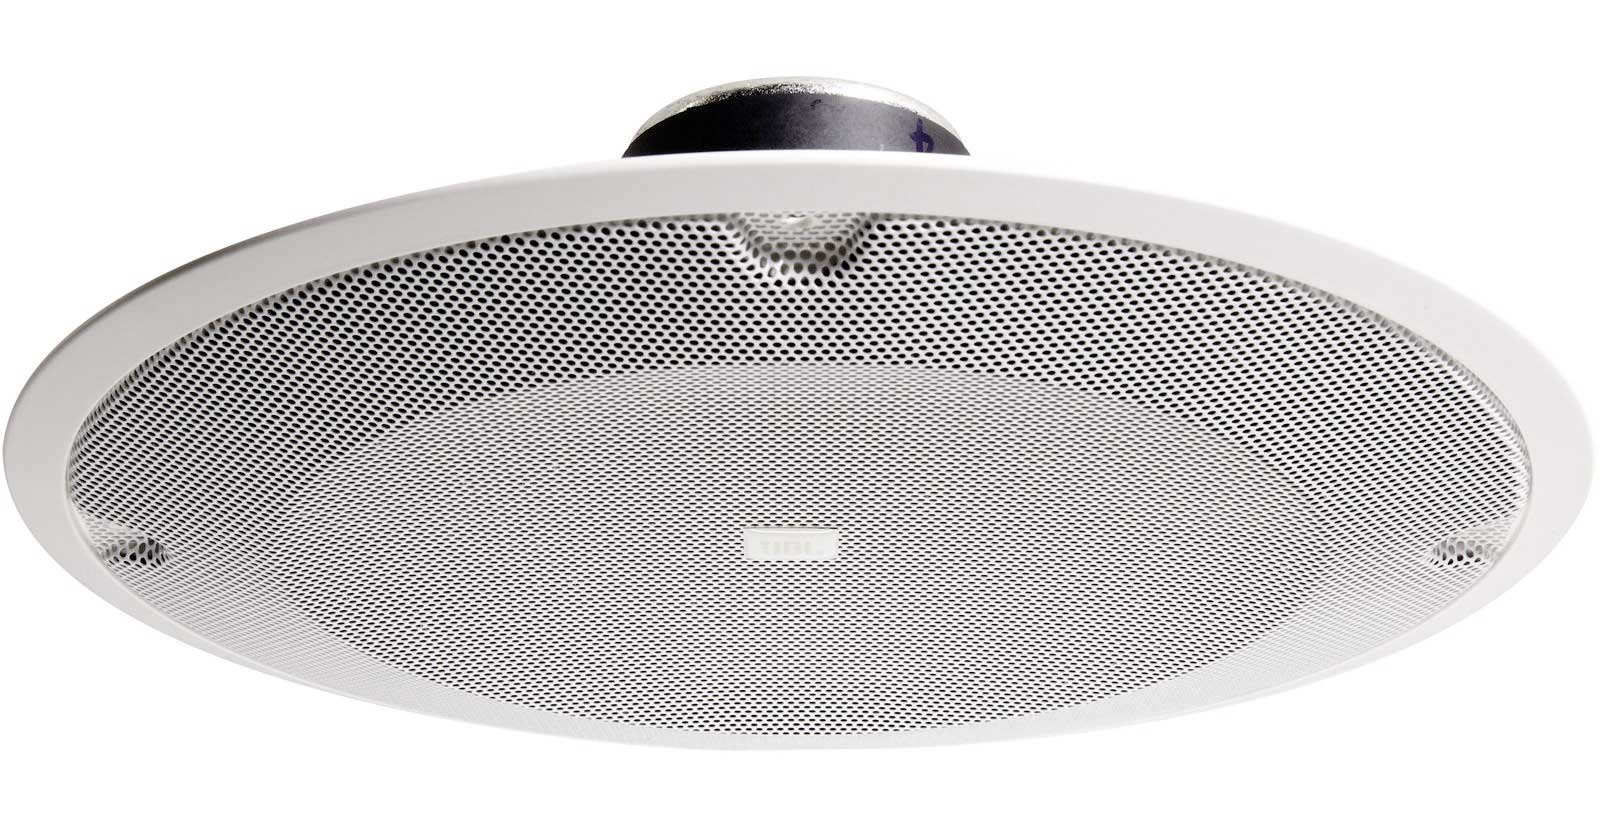 Jbl 8128 ceiling speaker honeywell lyric round thermostat